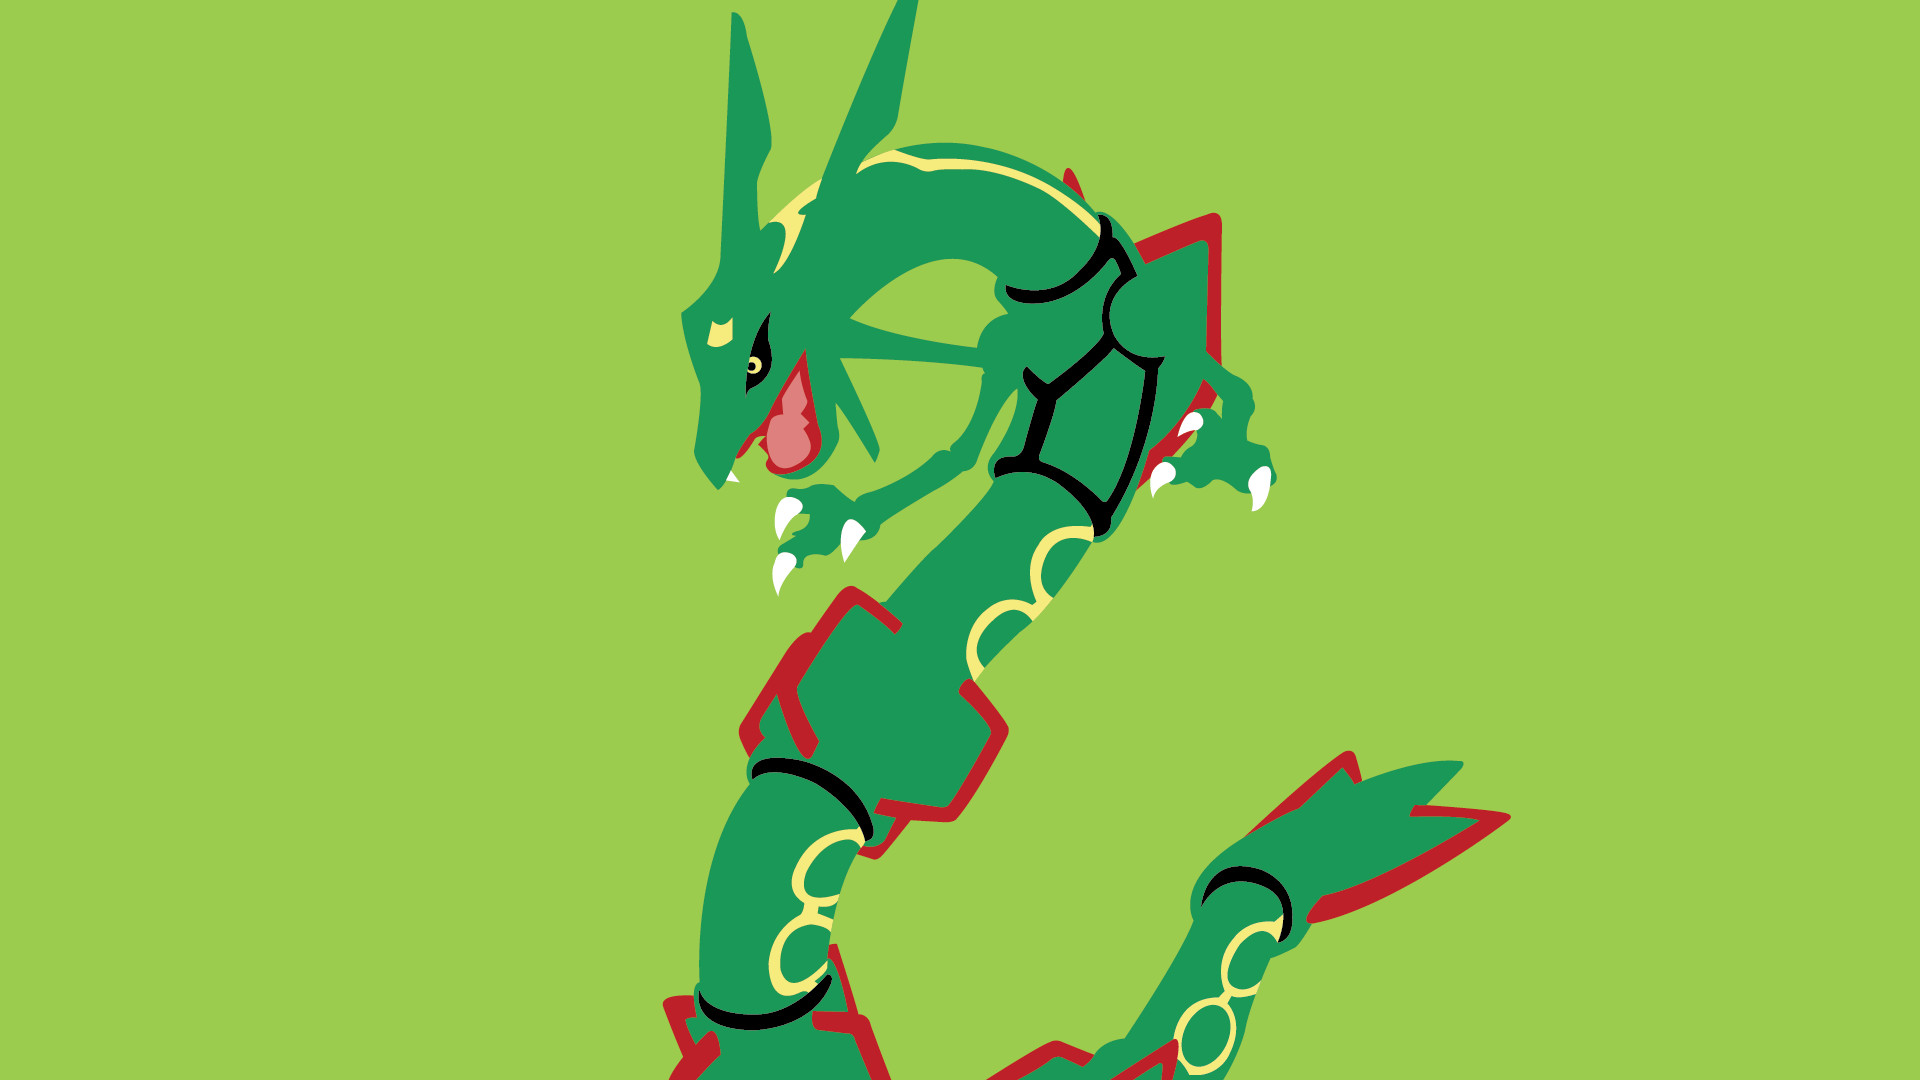 Adorable Pokemon Mega Rayquaza Wallpaper, 5998139 1920×1080